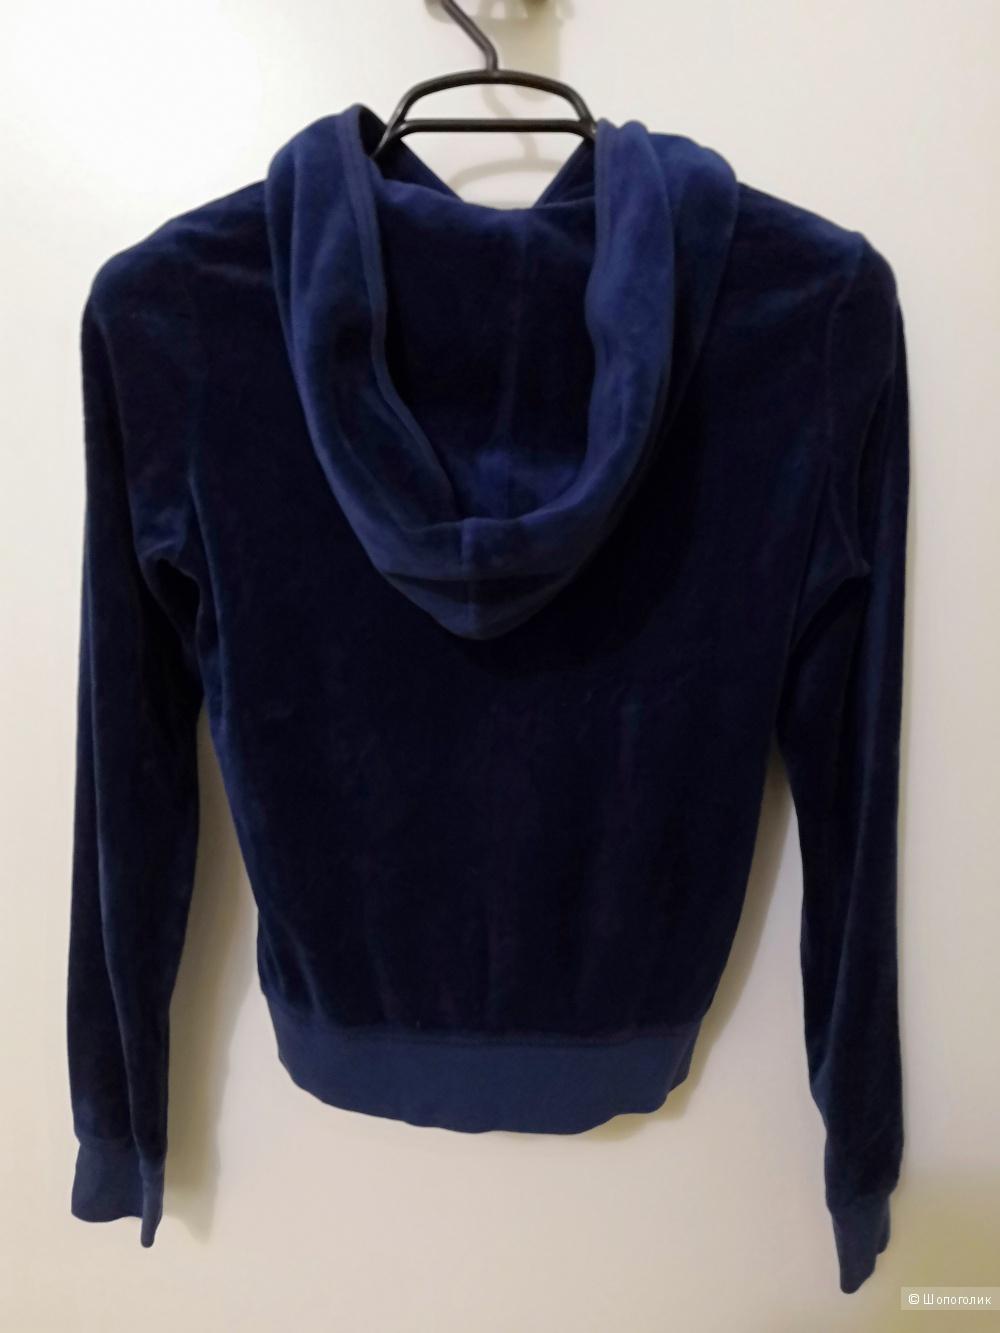 Велюровая кофточка Juicy couture, размер М